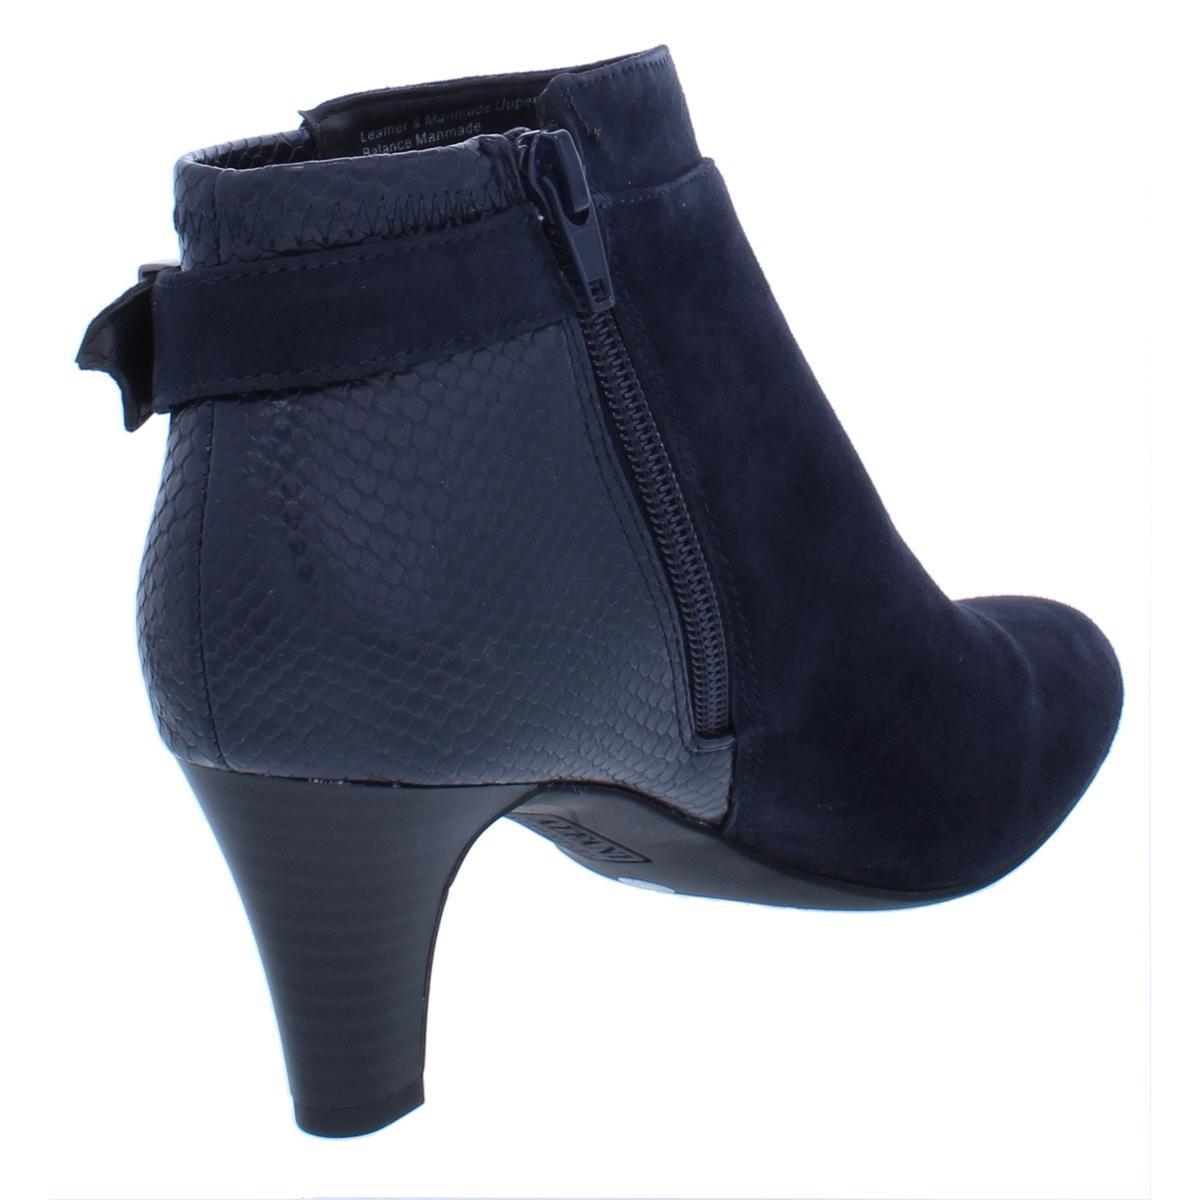 Alfani Womens Viollet Buckle Almond Toe Fashion Booties Shoes BHFO 5402